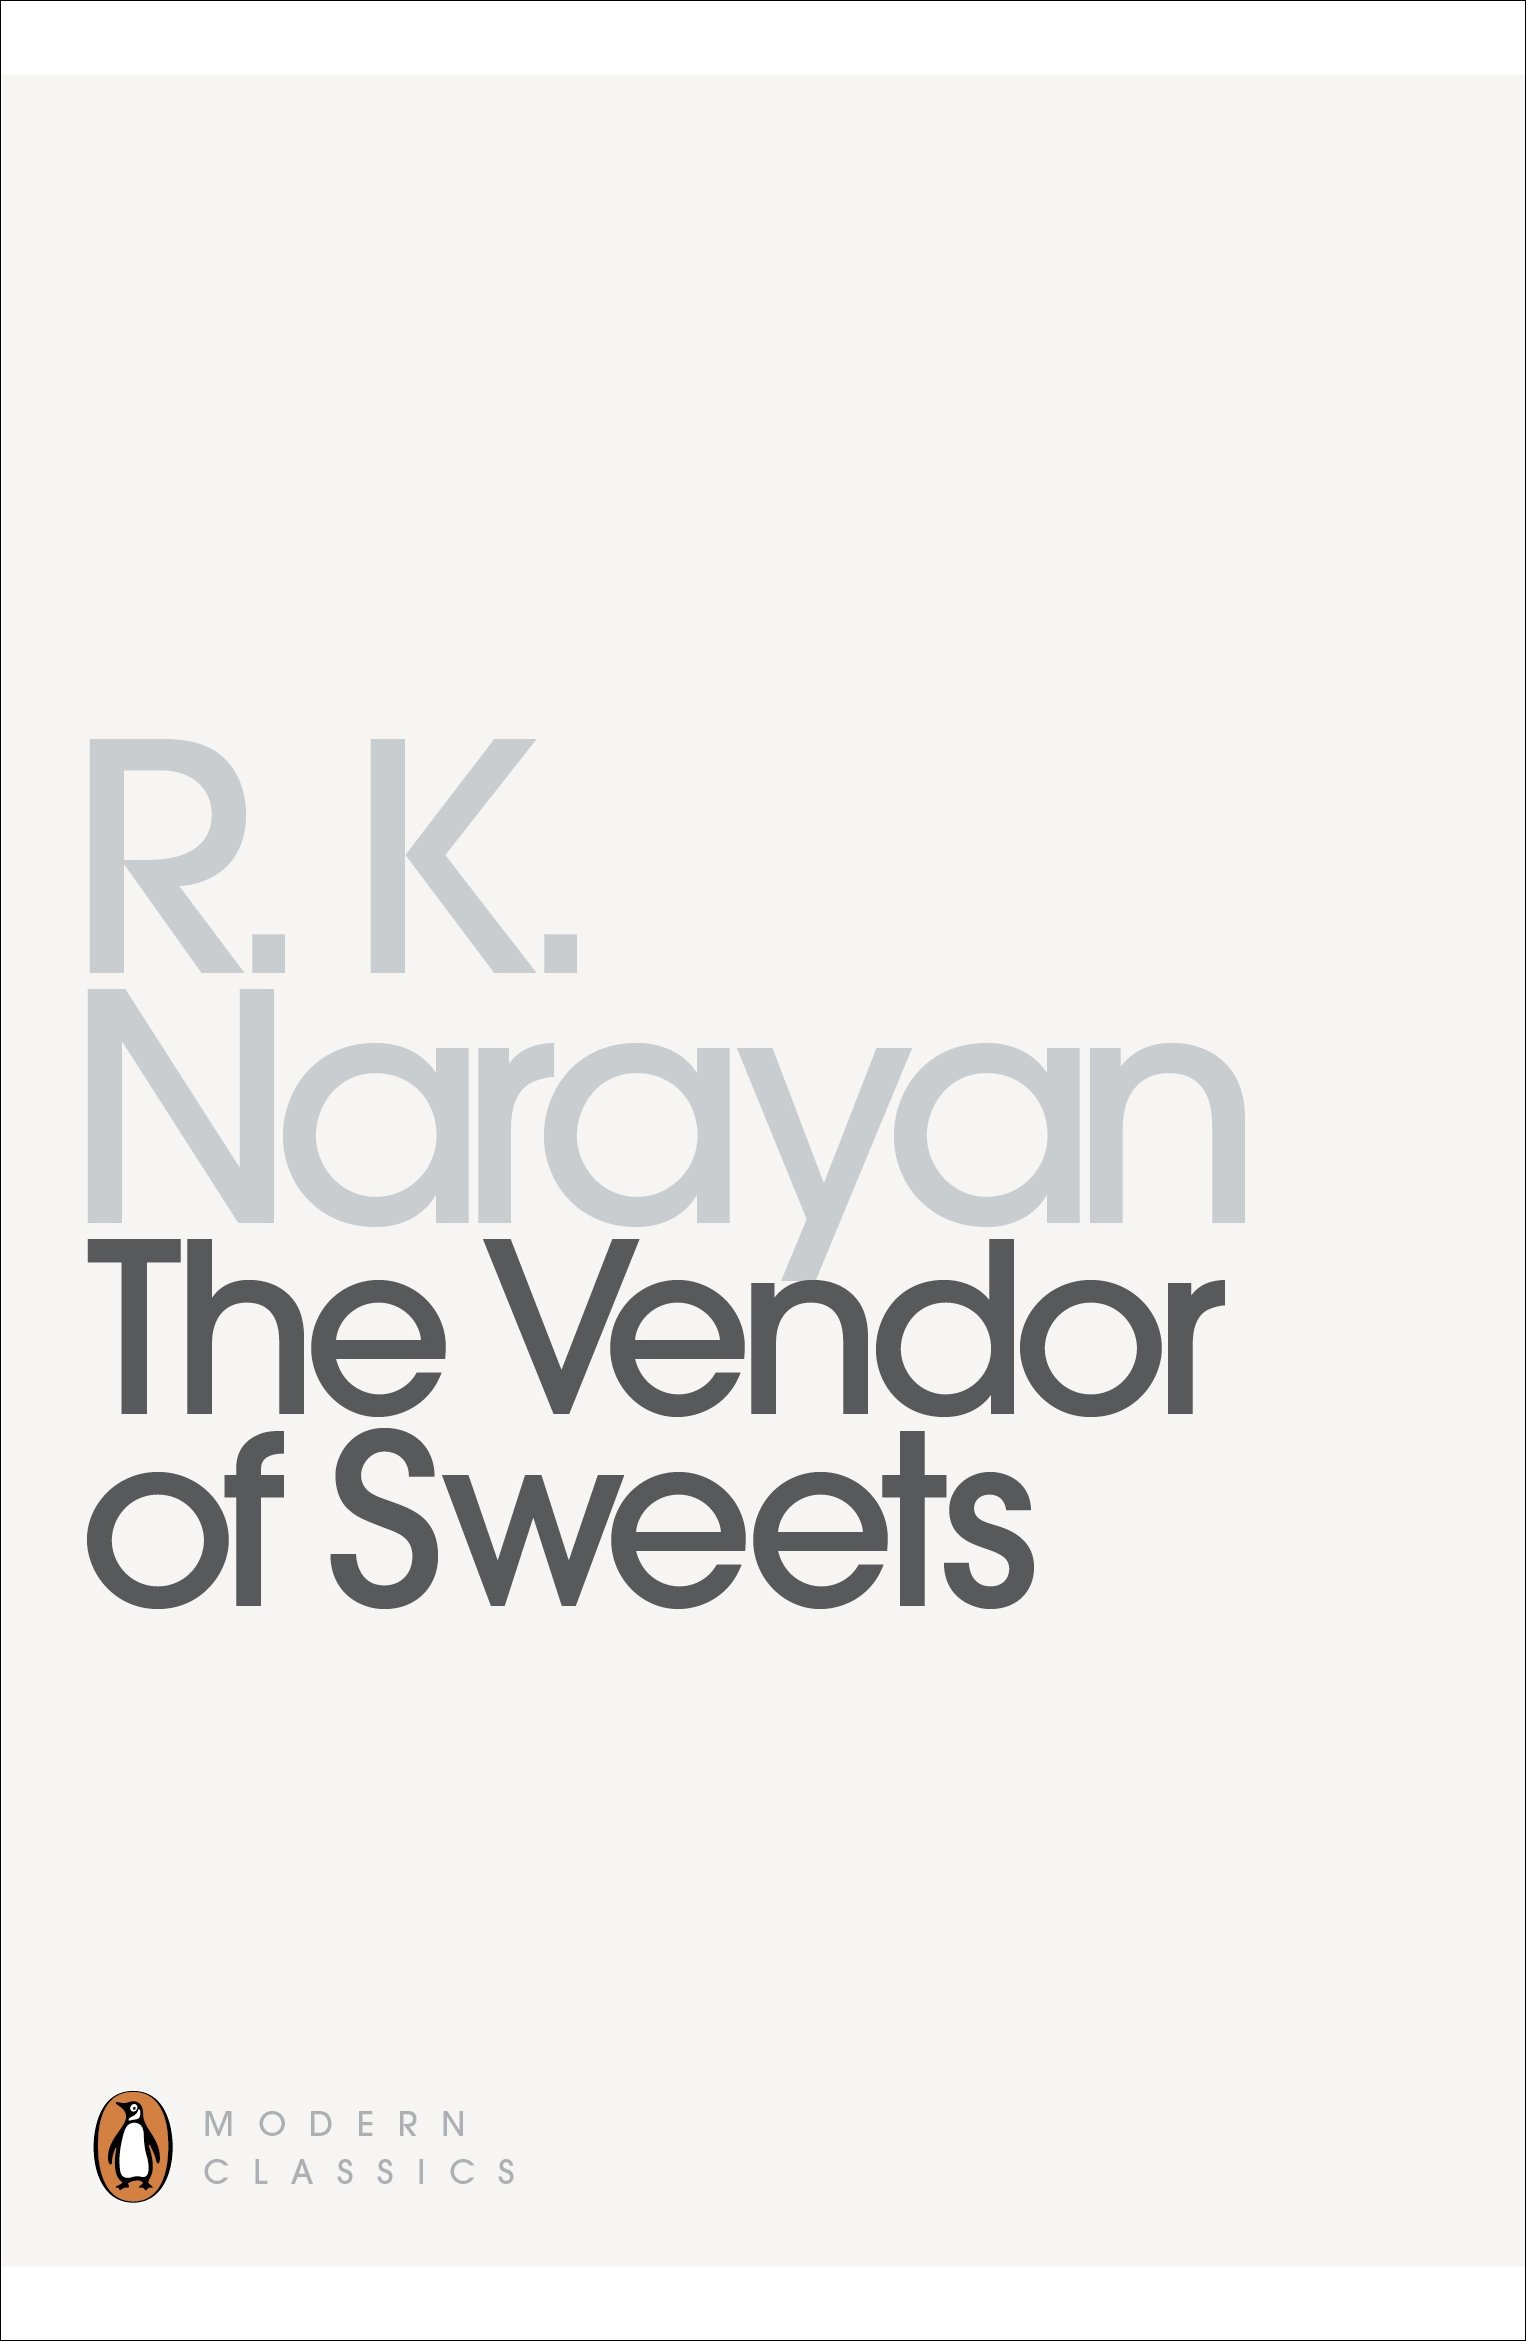 The Vendor Of Sweets Penguin Twentieth Century Classics R K Narayan 9780140185508 Amazon Books